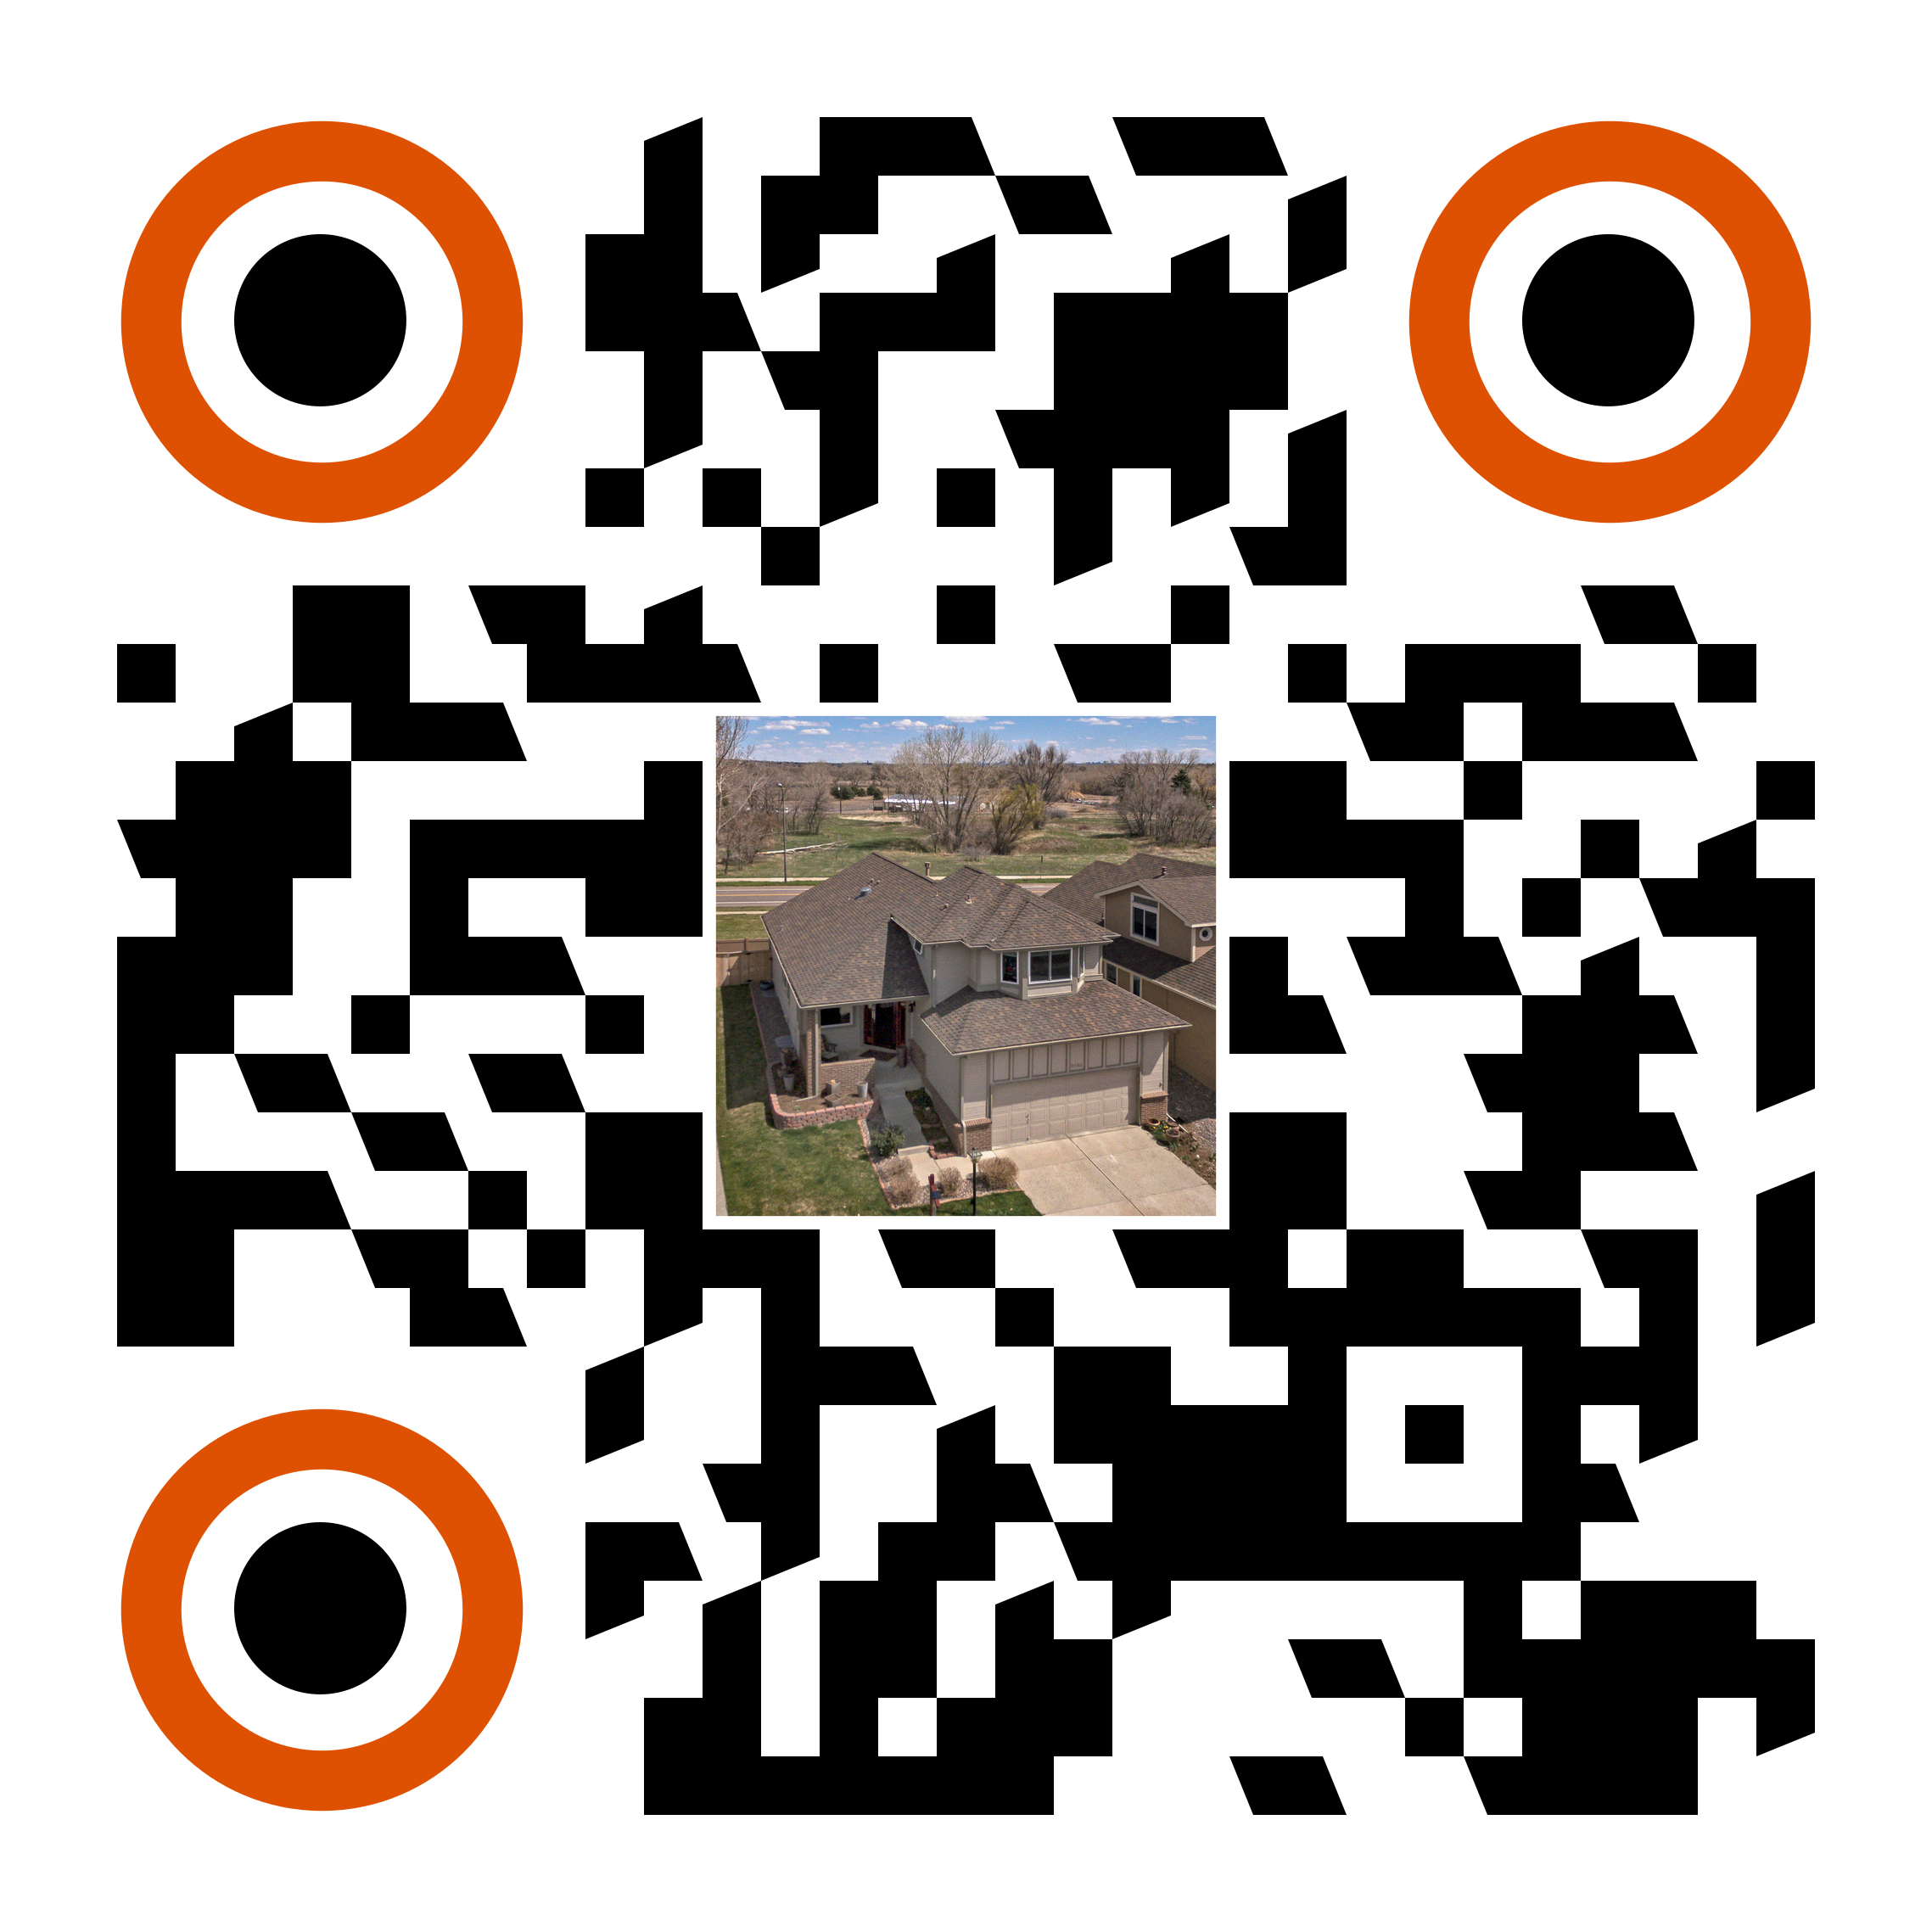 Custom QR code by R